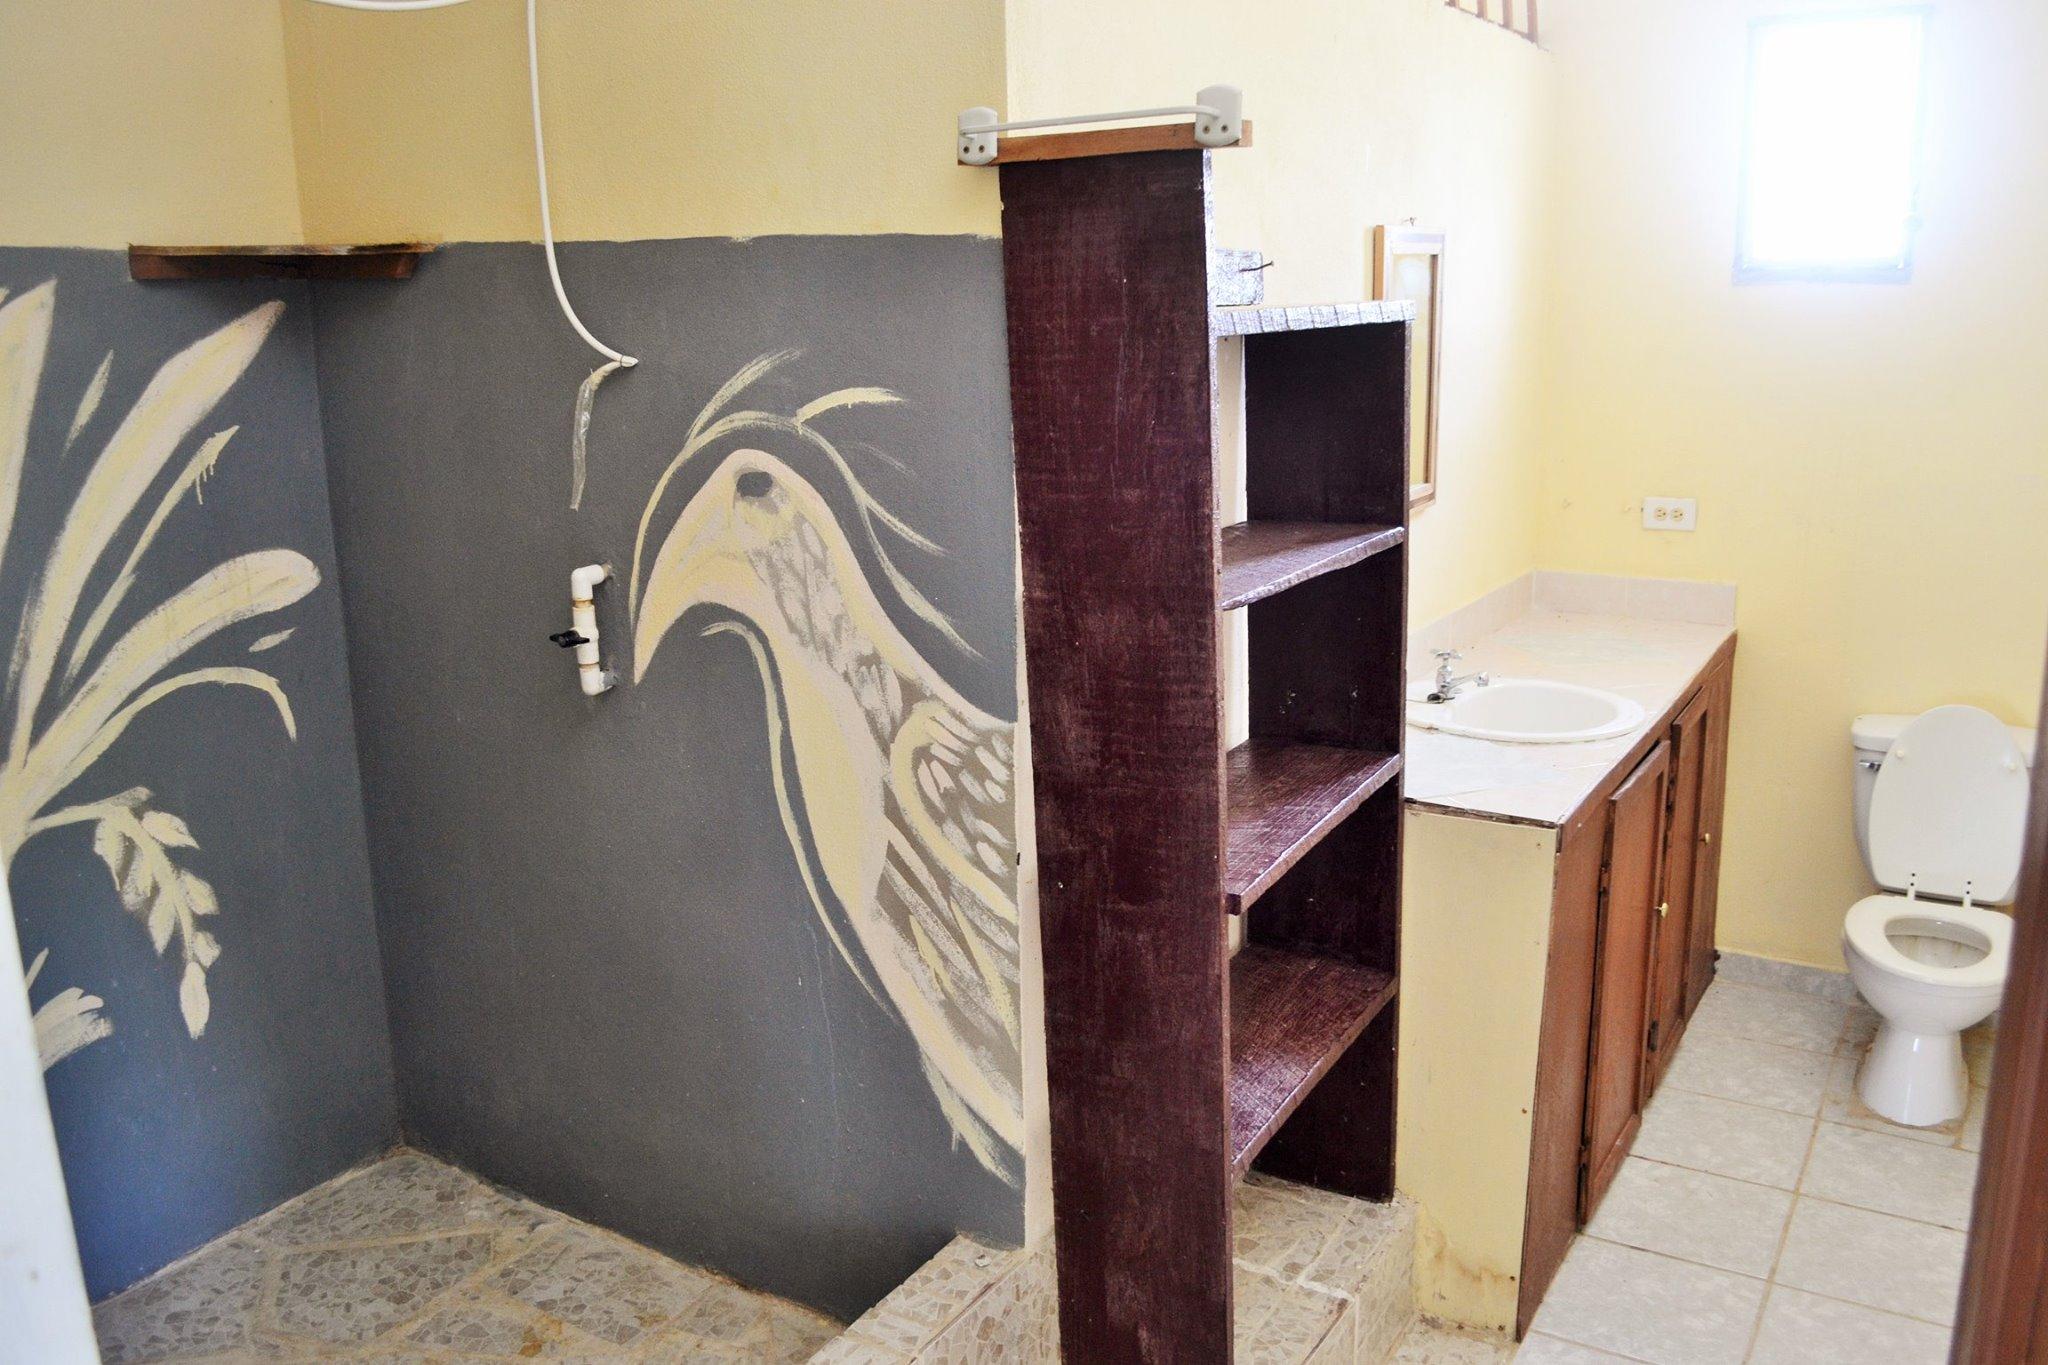 3 Bedroom unfurnished apartment